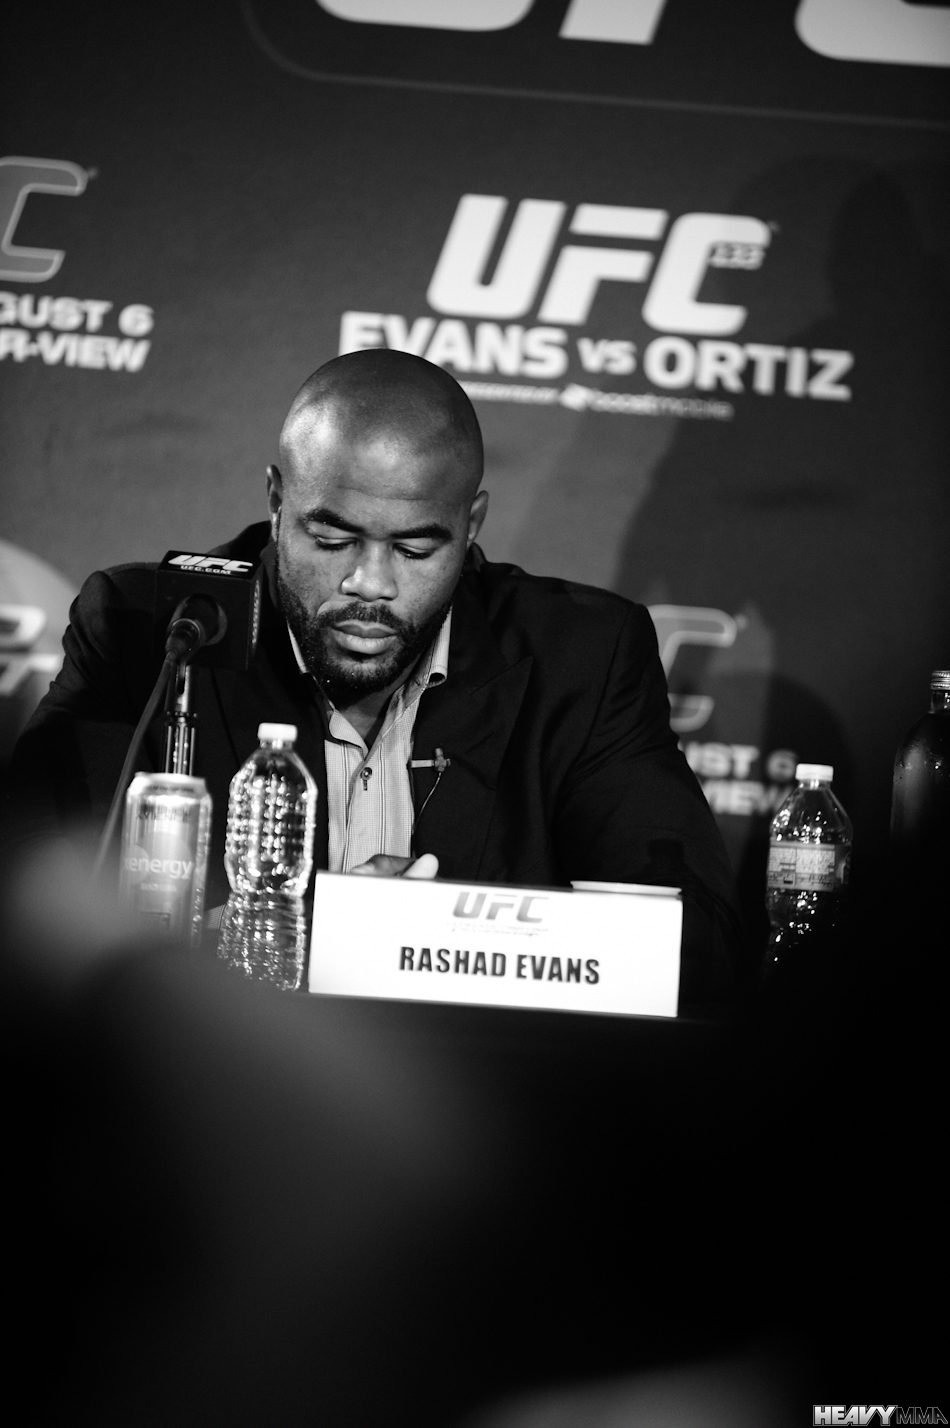 UFC 133 - Evans vs Ortiz 2 059